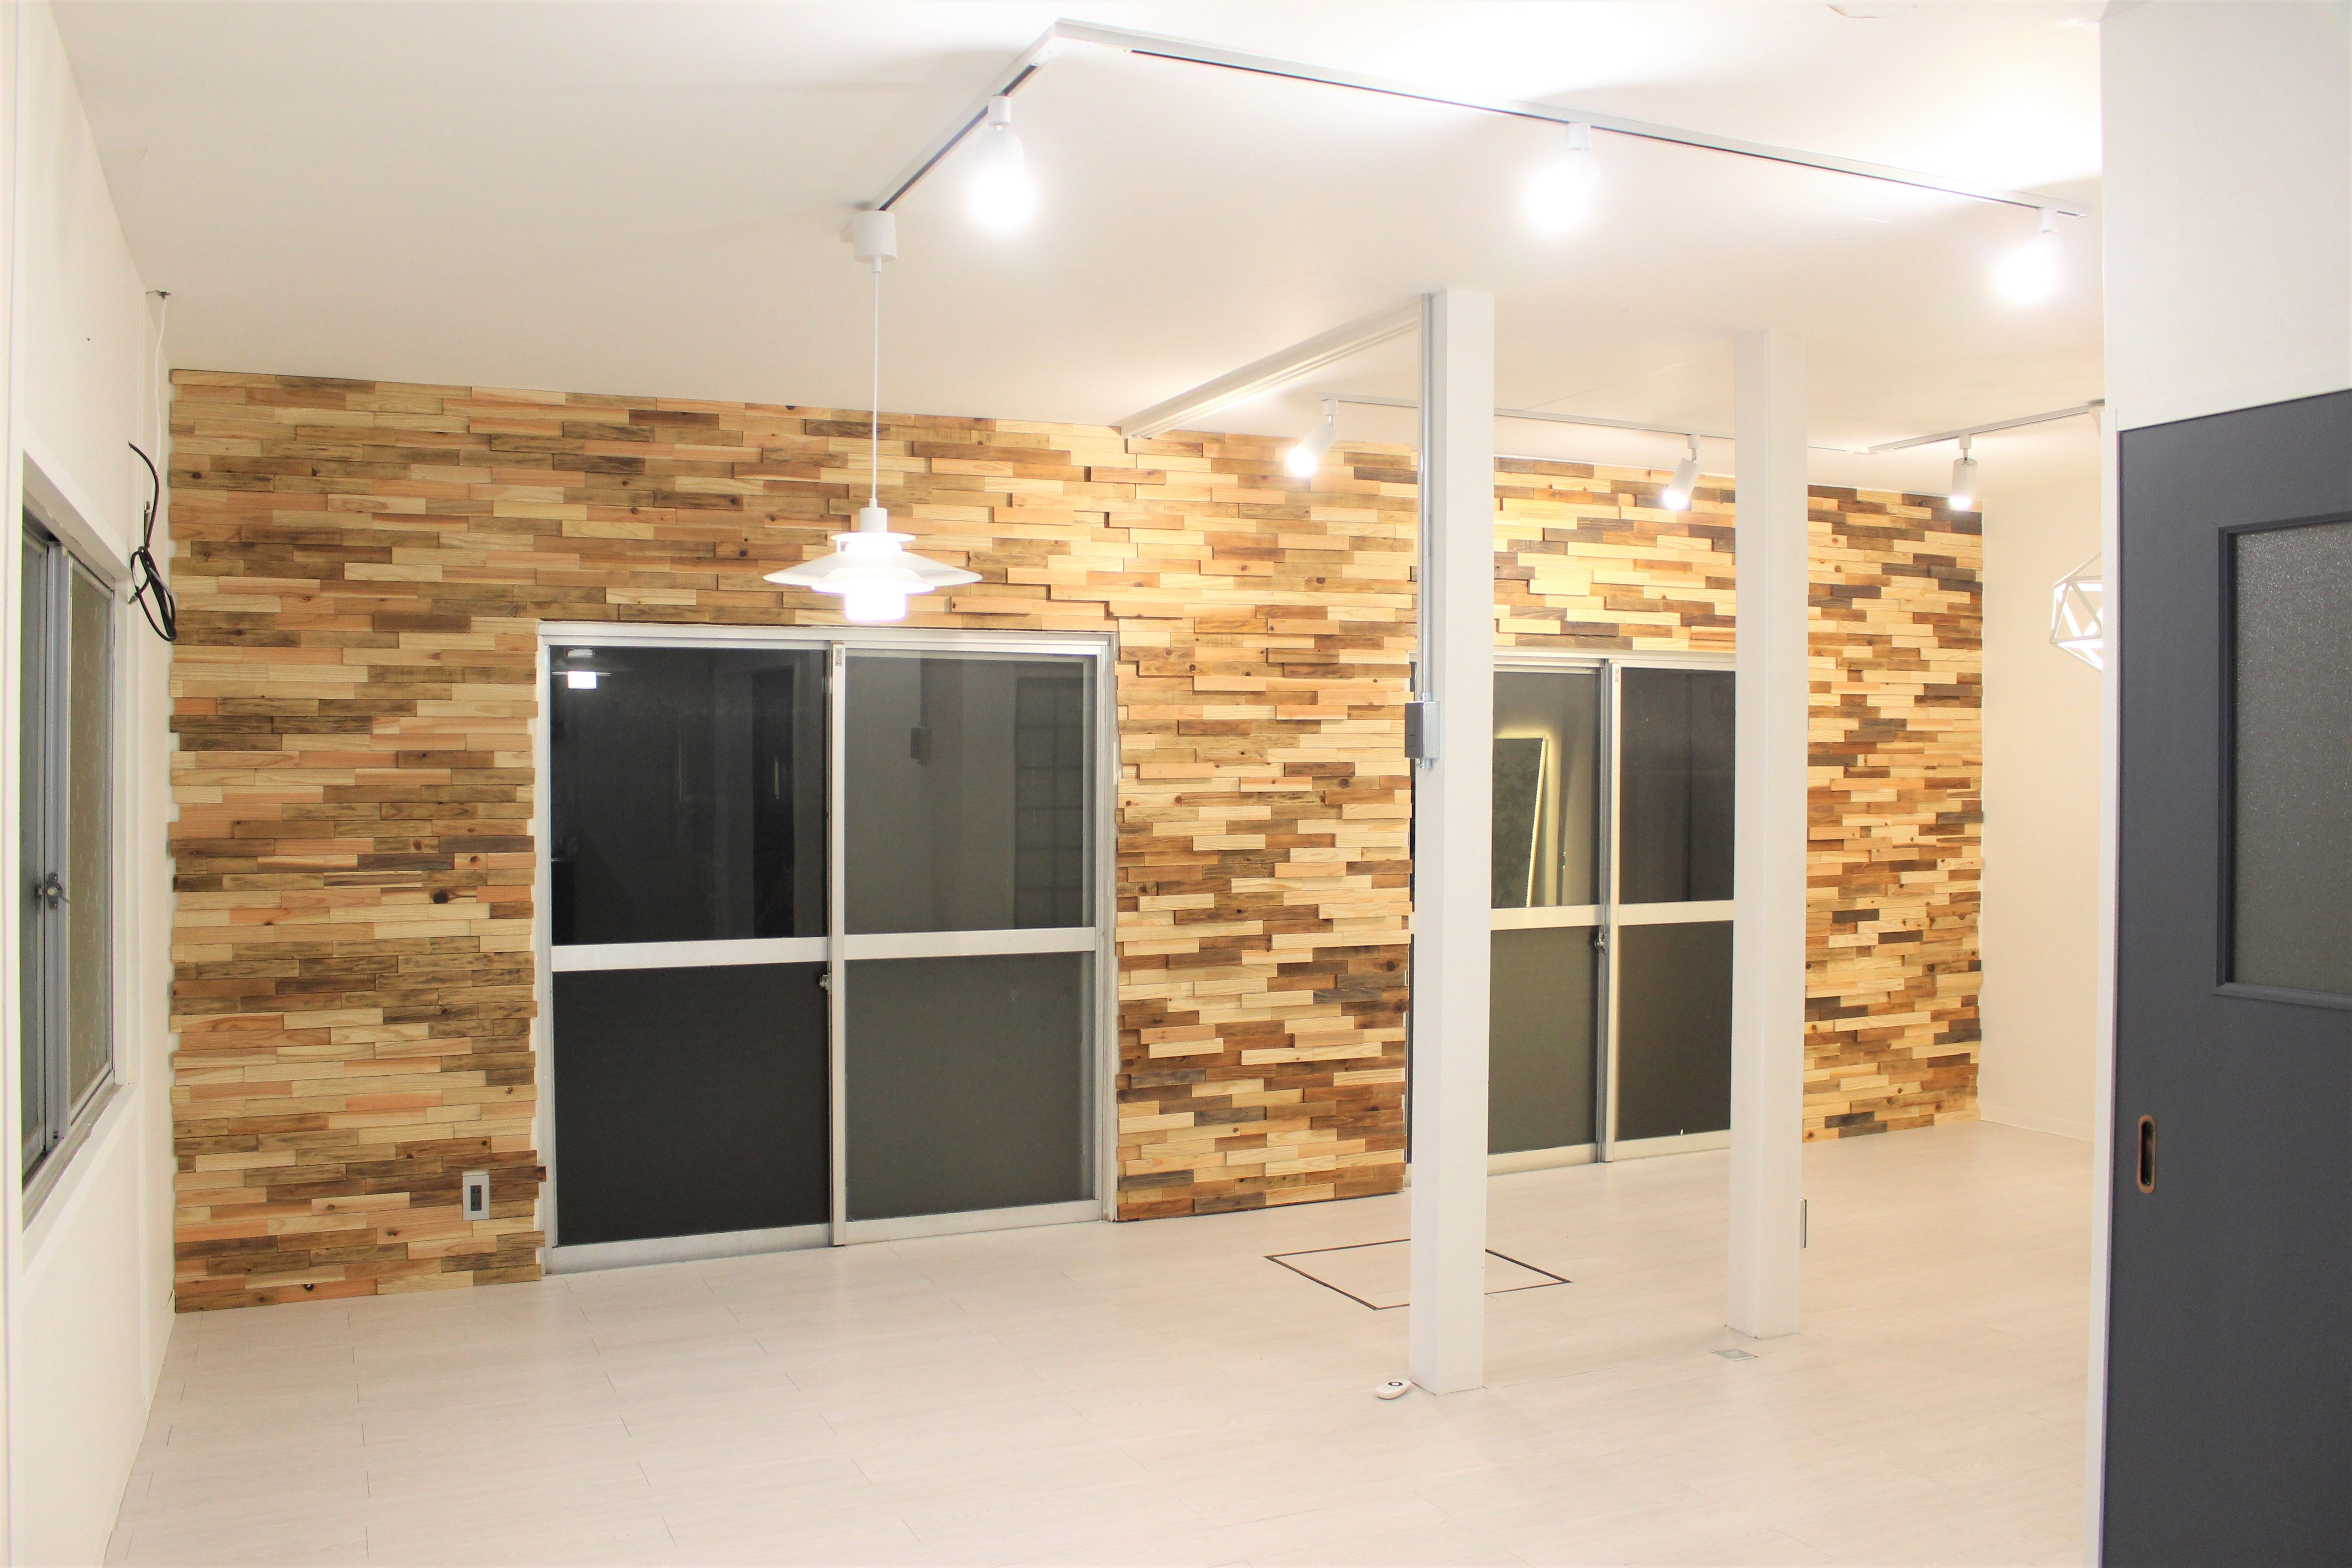 Diy 築45年空き家を20万円でセルフリノベーション 作業内容と費用を公開 2020 空き家 白い壁紙 古い キッチン